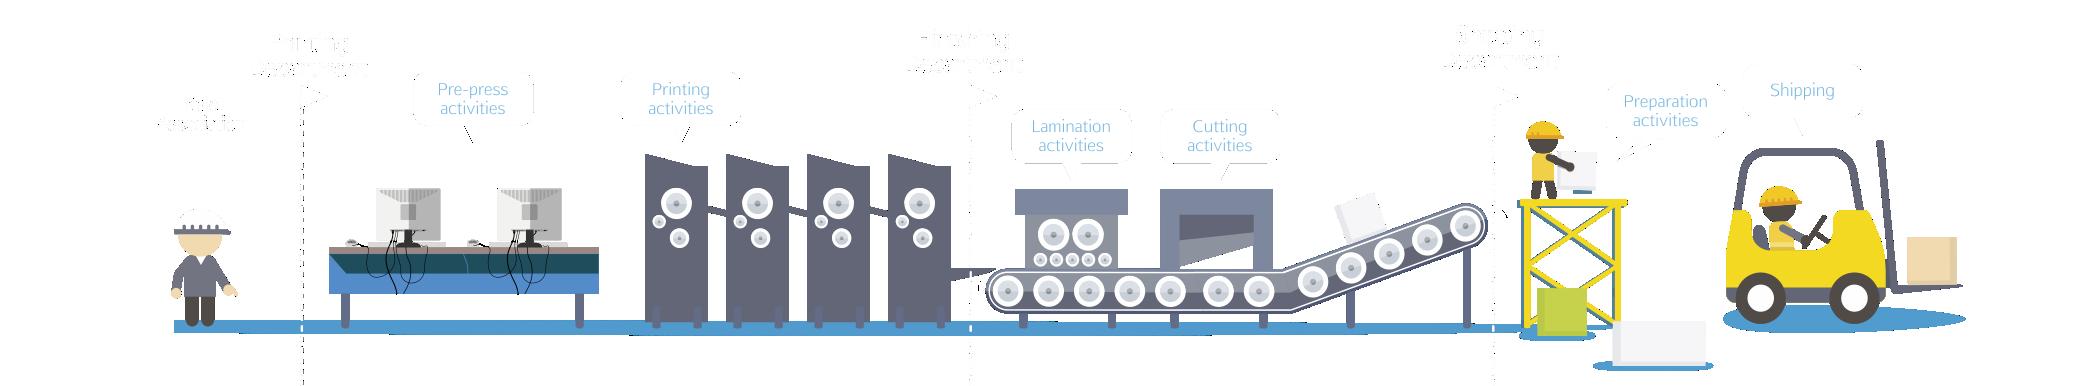 Workflow del print MIS